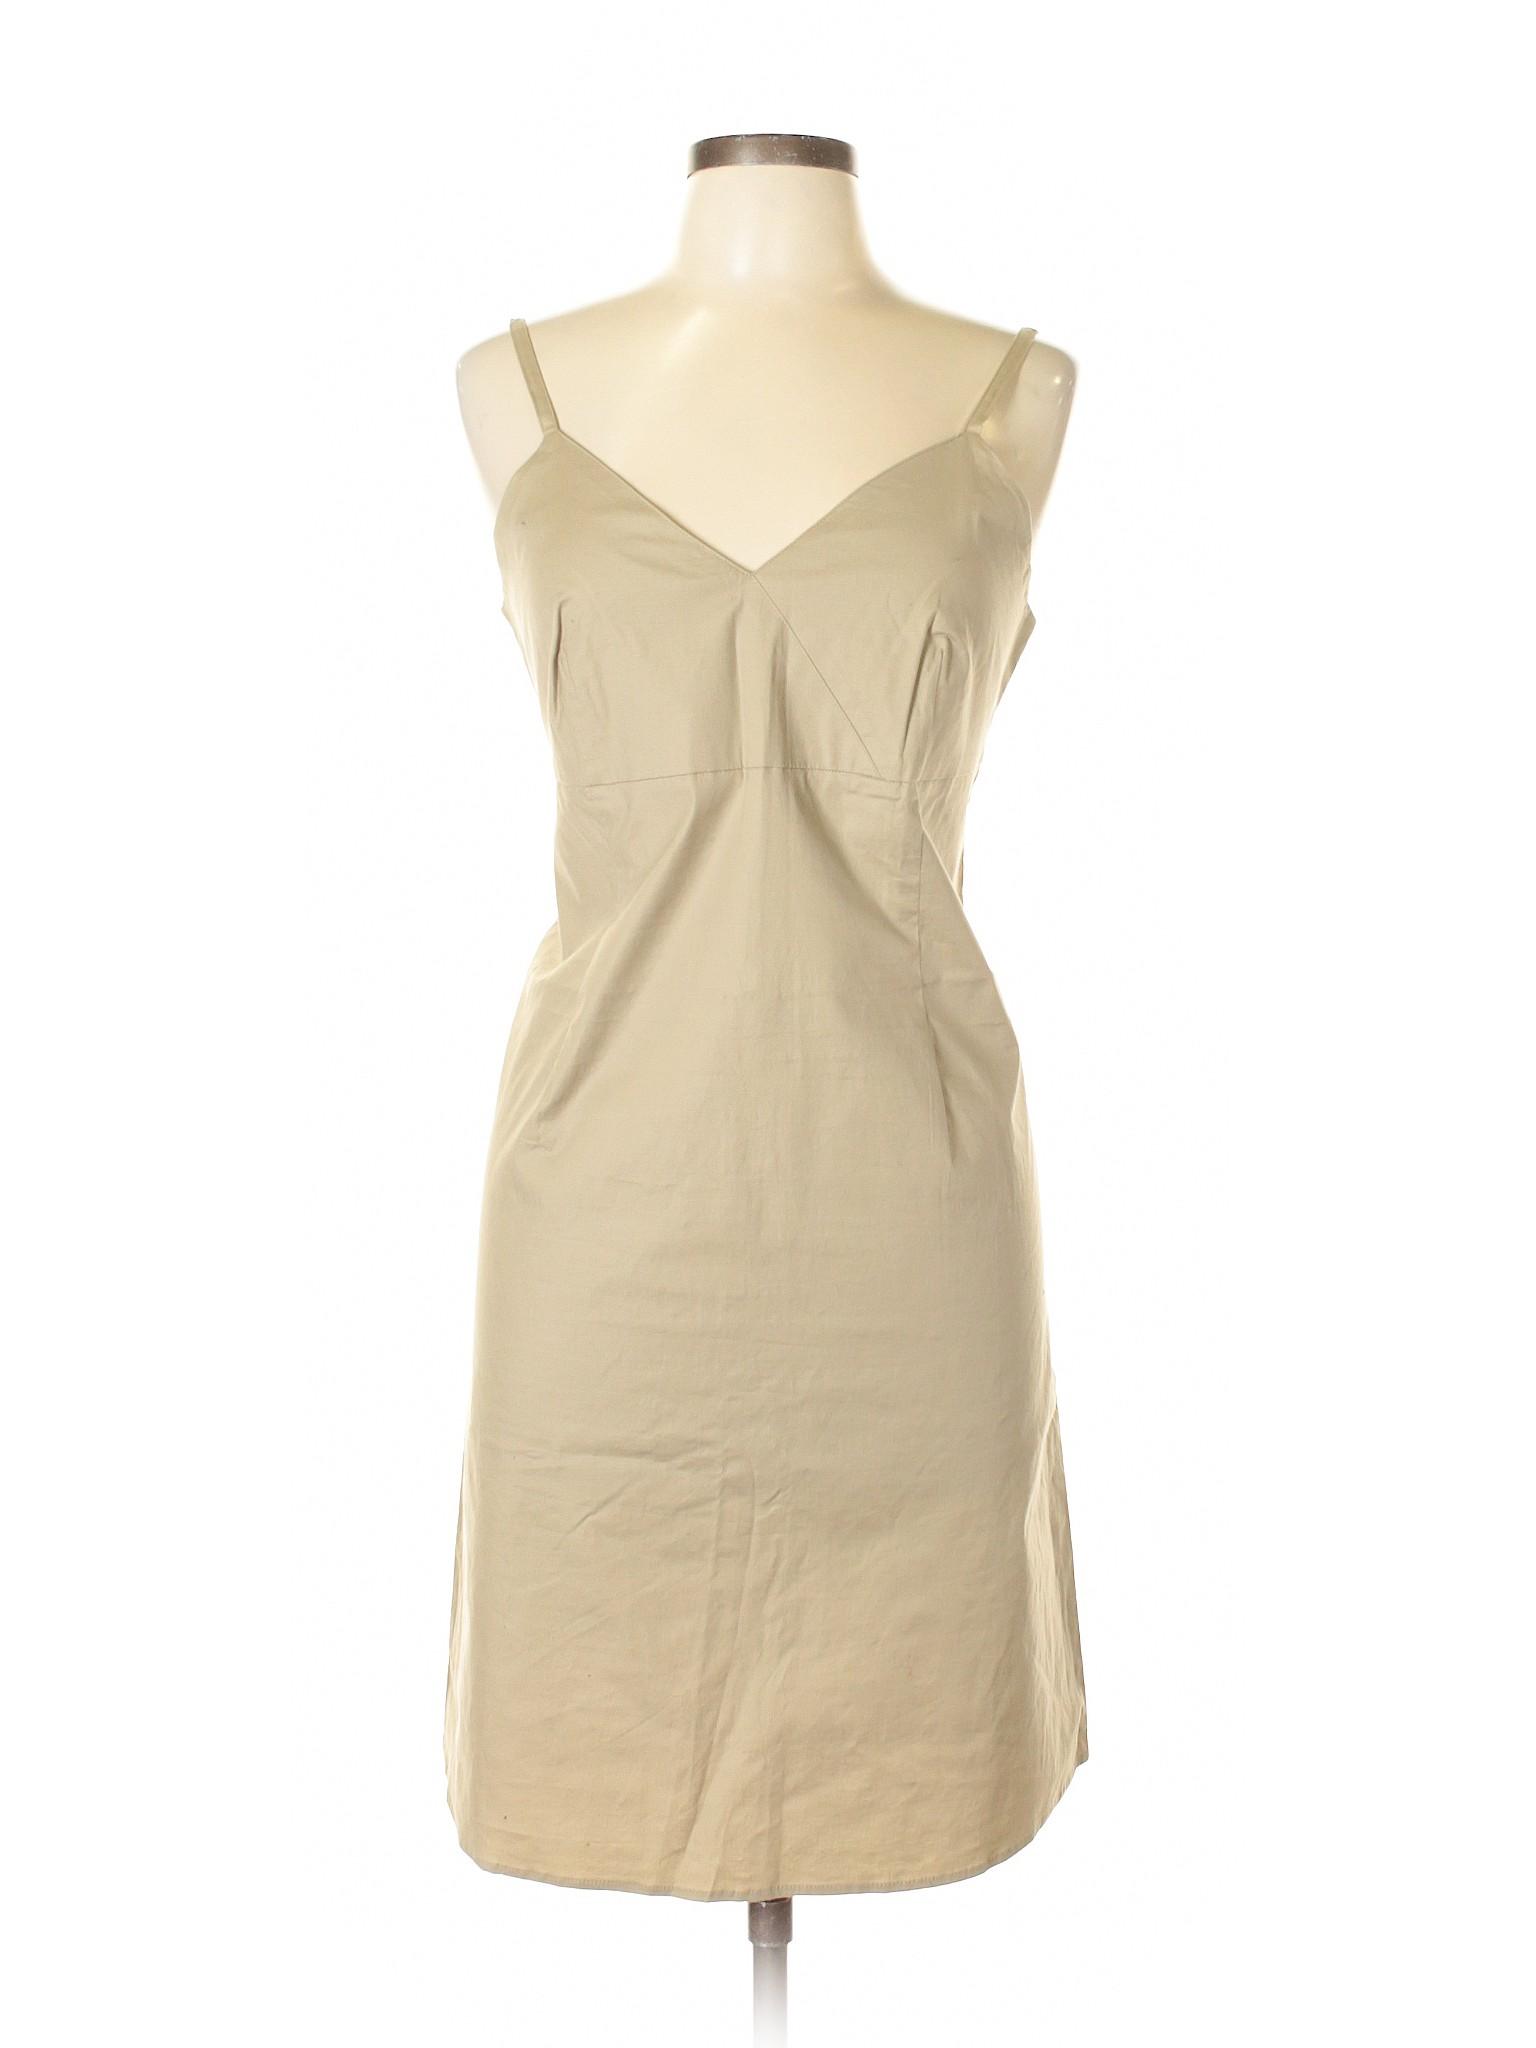 Boutique Boutique winter Dress Gap Casual Gap winter Casual w7pUSqxU